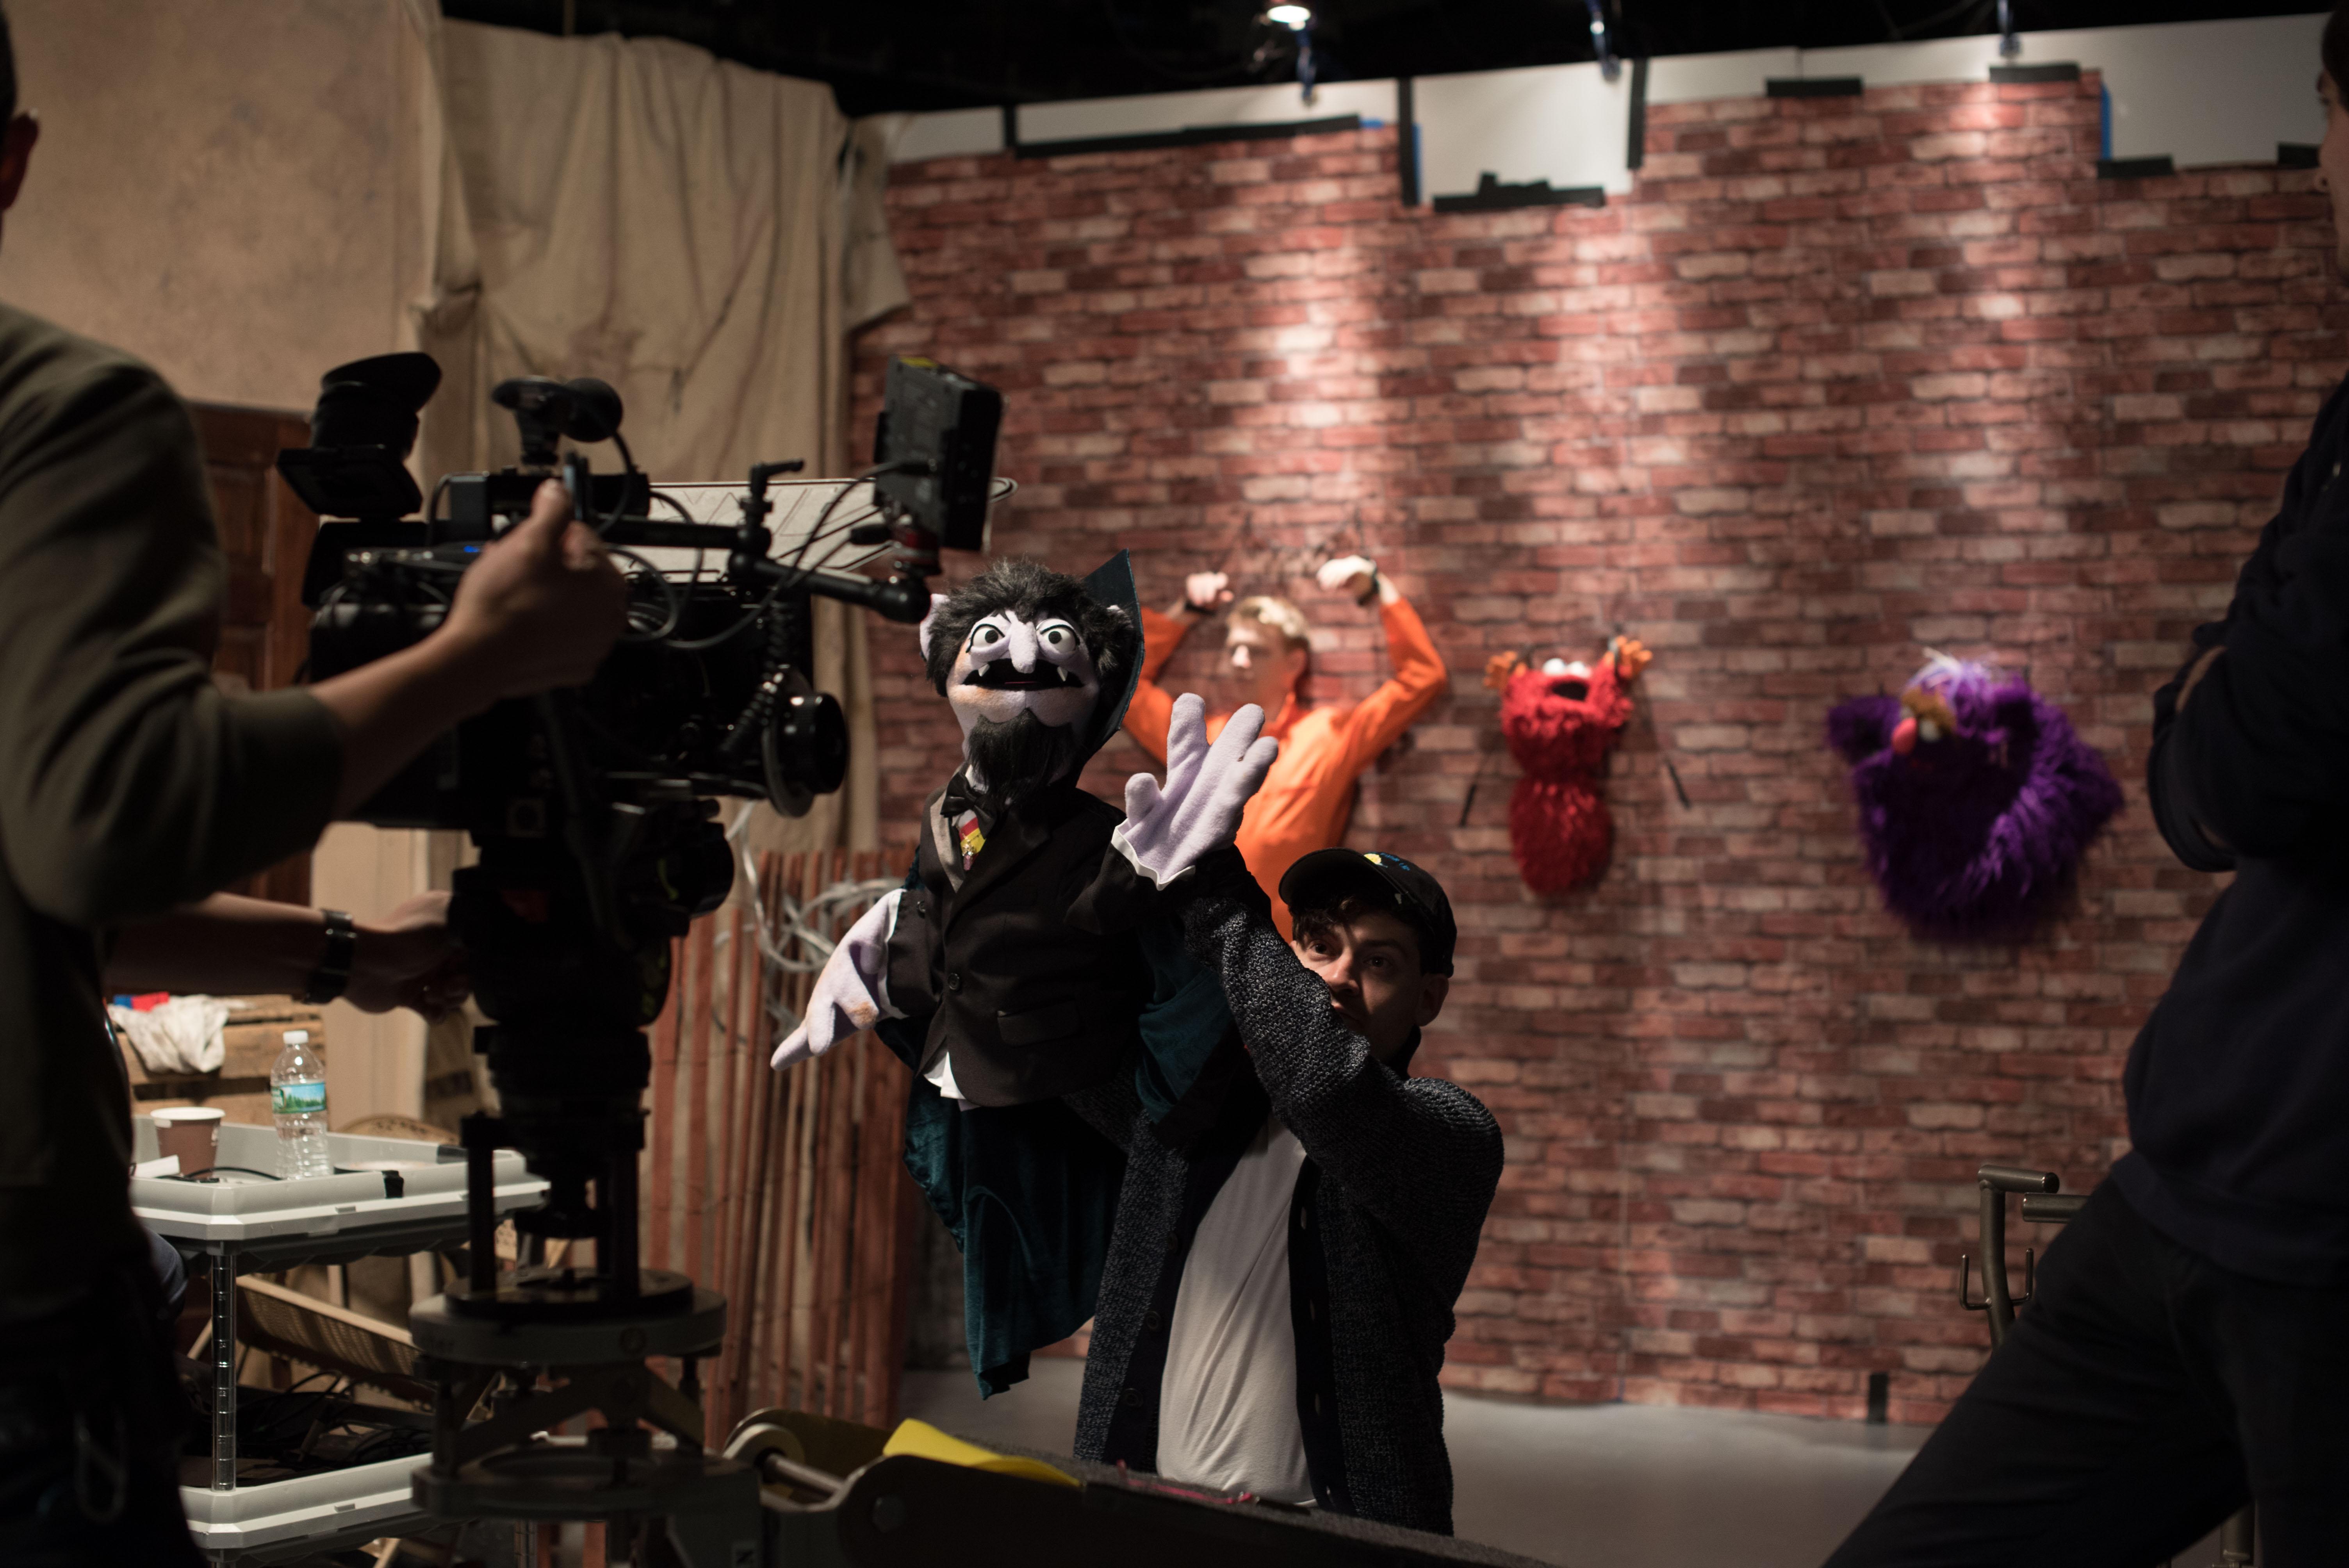 """BEST ENSEMBLE IN A DARK COMEDY"" (Portland Film Fest)"